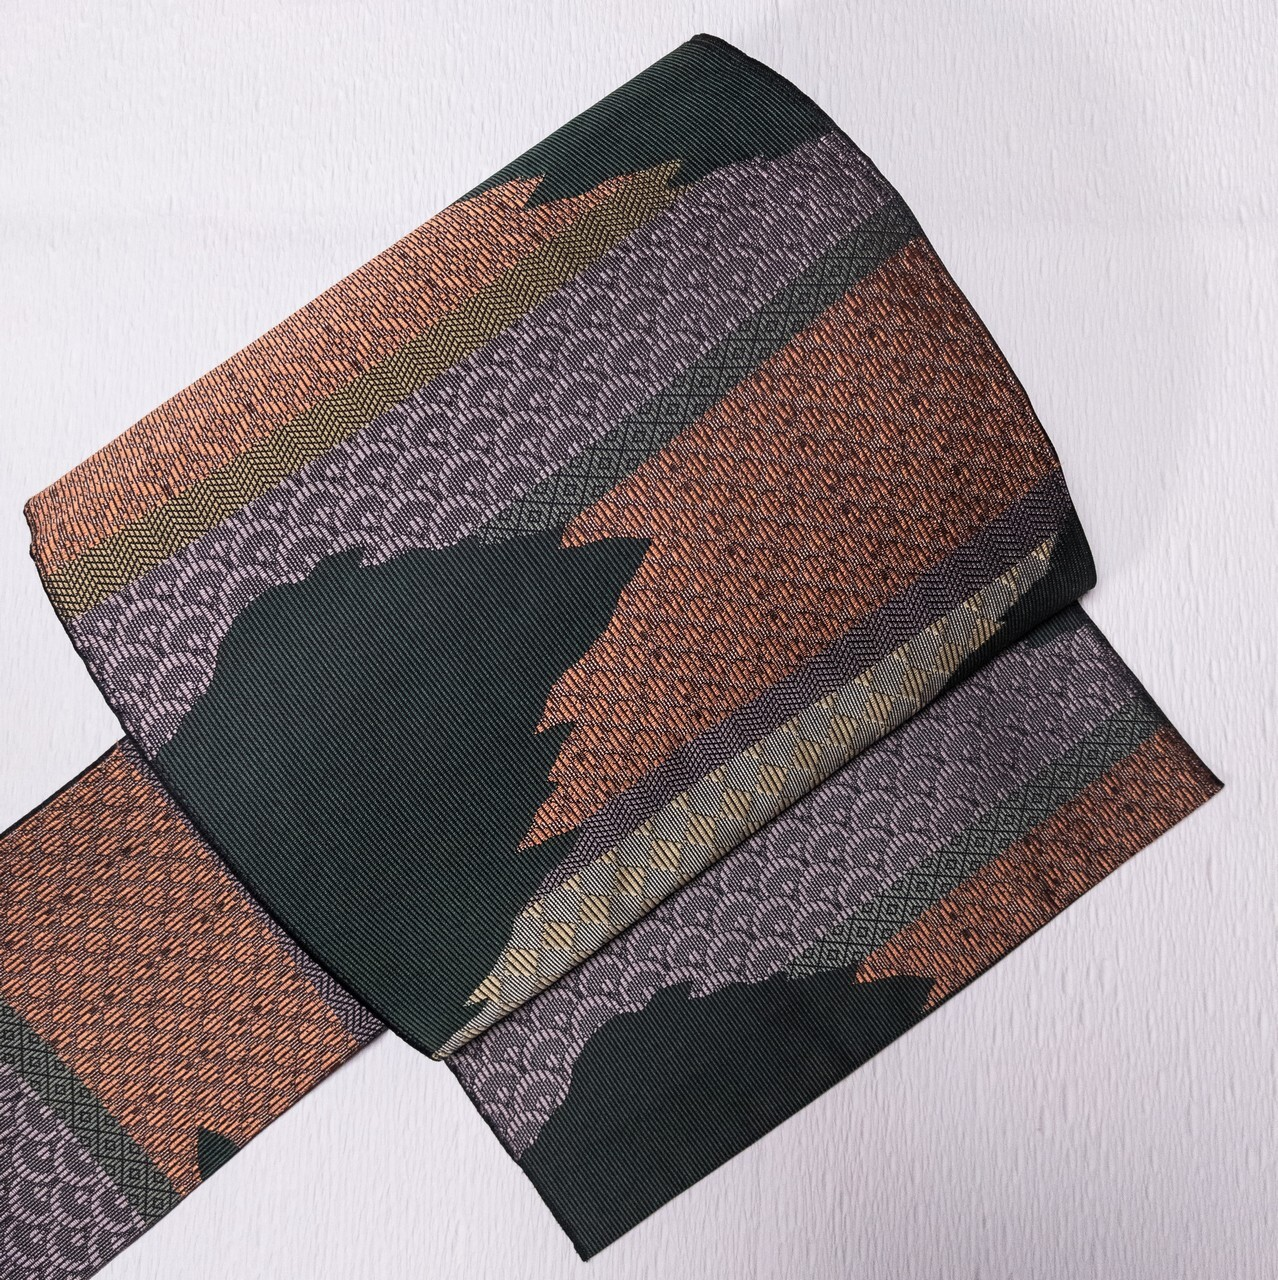 【未使用】8寸名古屋帯 交織 破れ横段 菱文 青海波 織出し 濃い深緑ベース